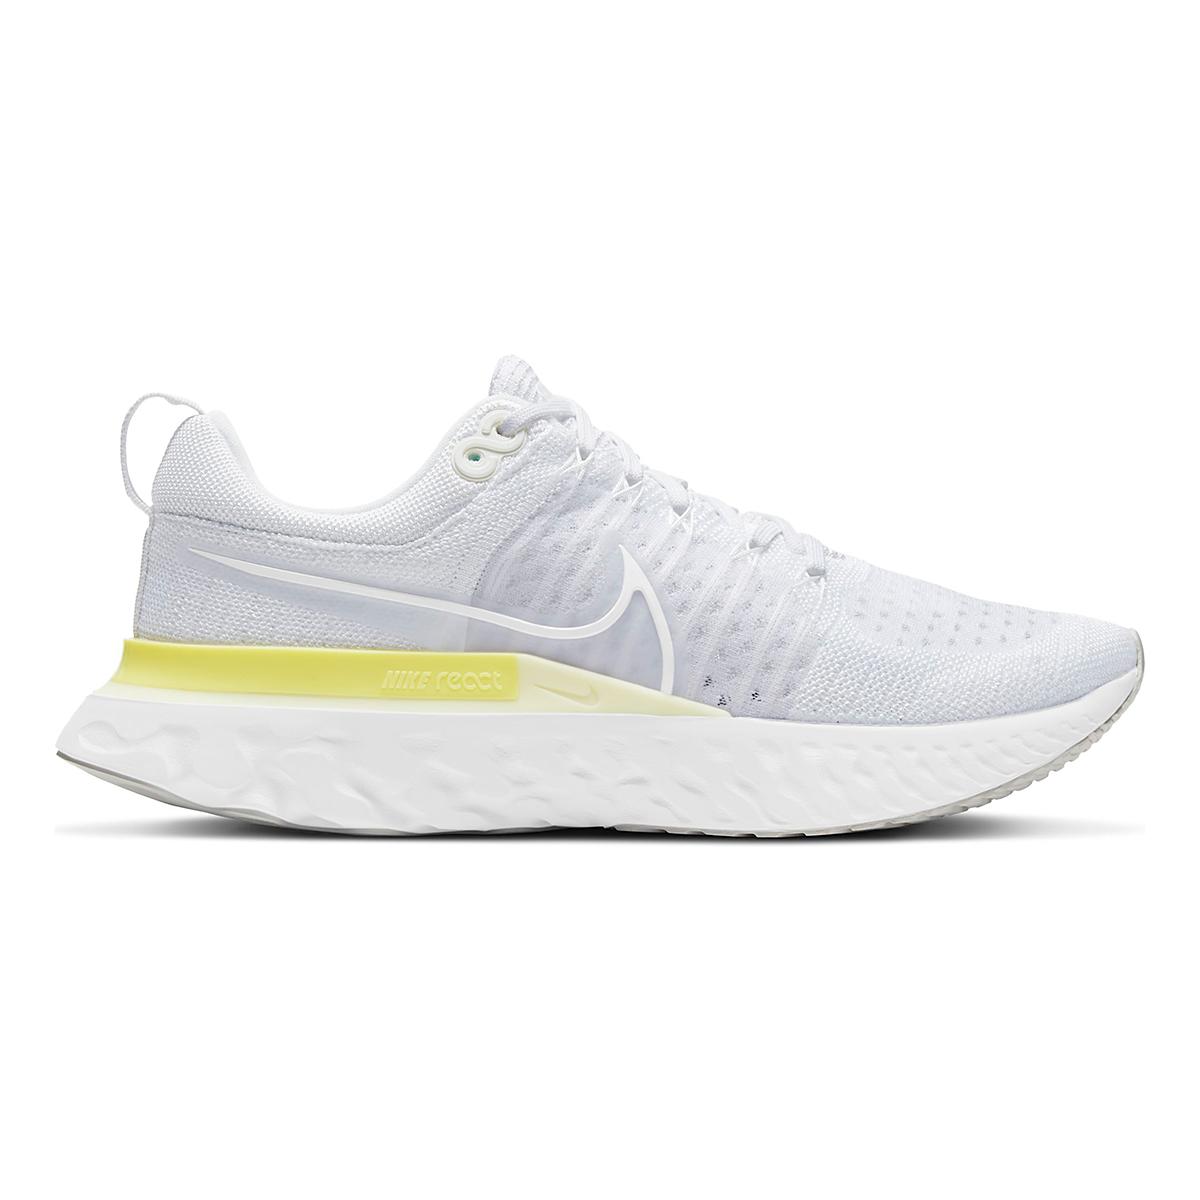 Women's Nike React Infinity Run Flyknit 2 Running Shoe - Color: White/White-Platinum Tint/Light Zitron - Size: 5 - Width: Regular, White/White-Platinum Tint/Light Zitron, large, image 1